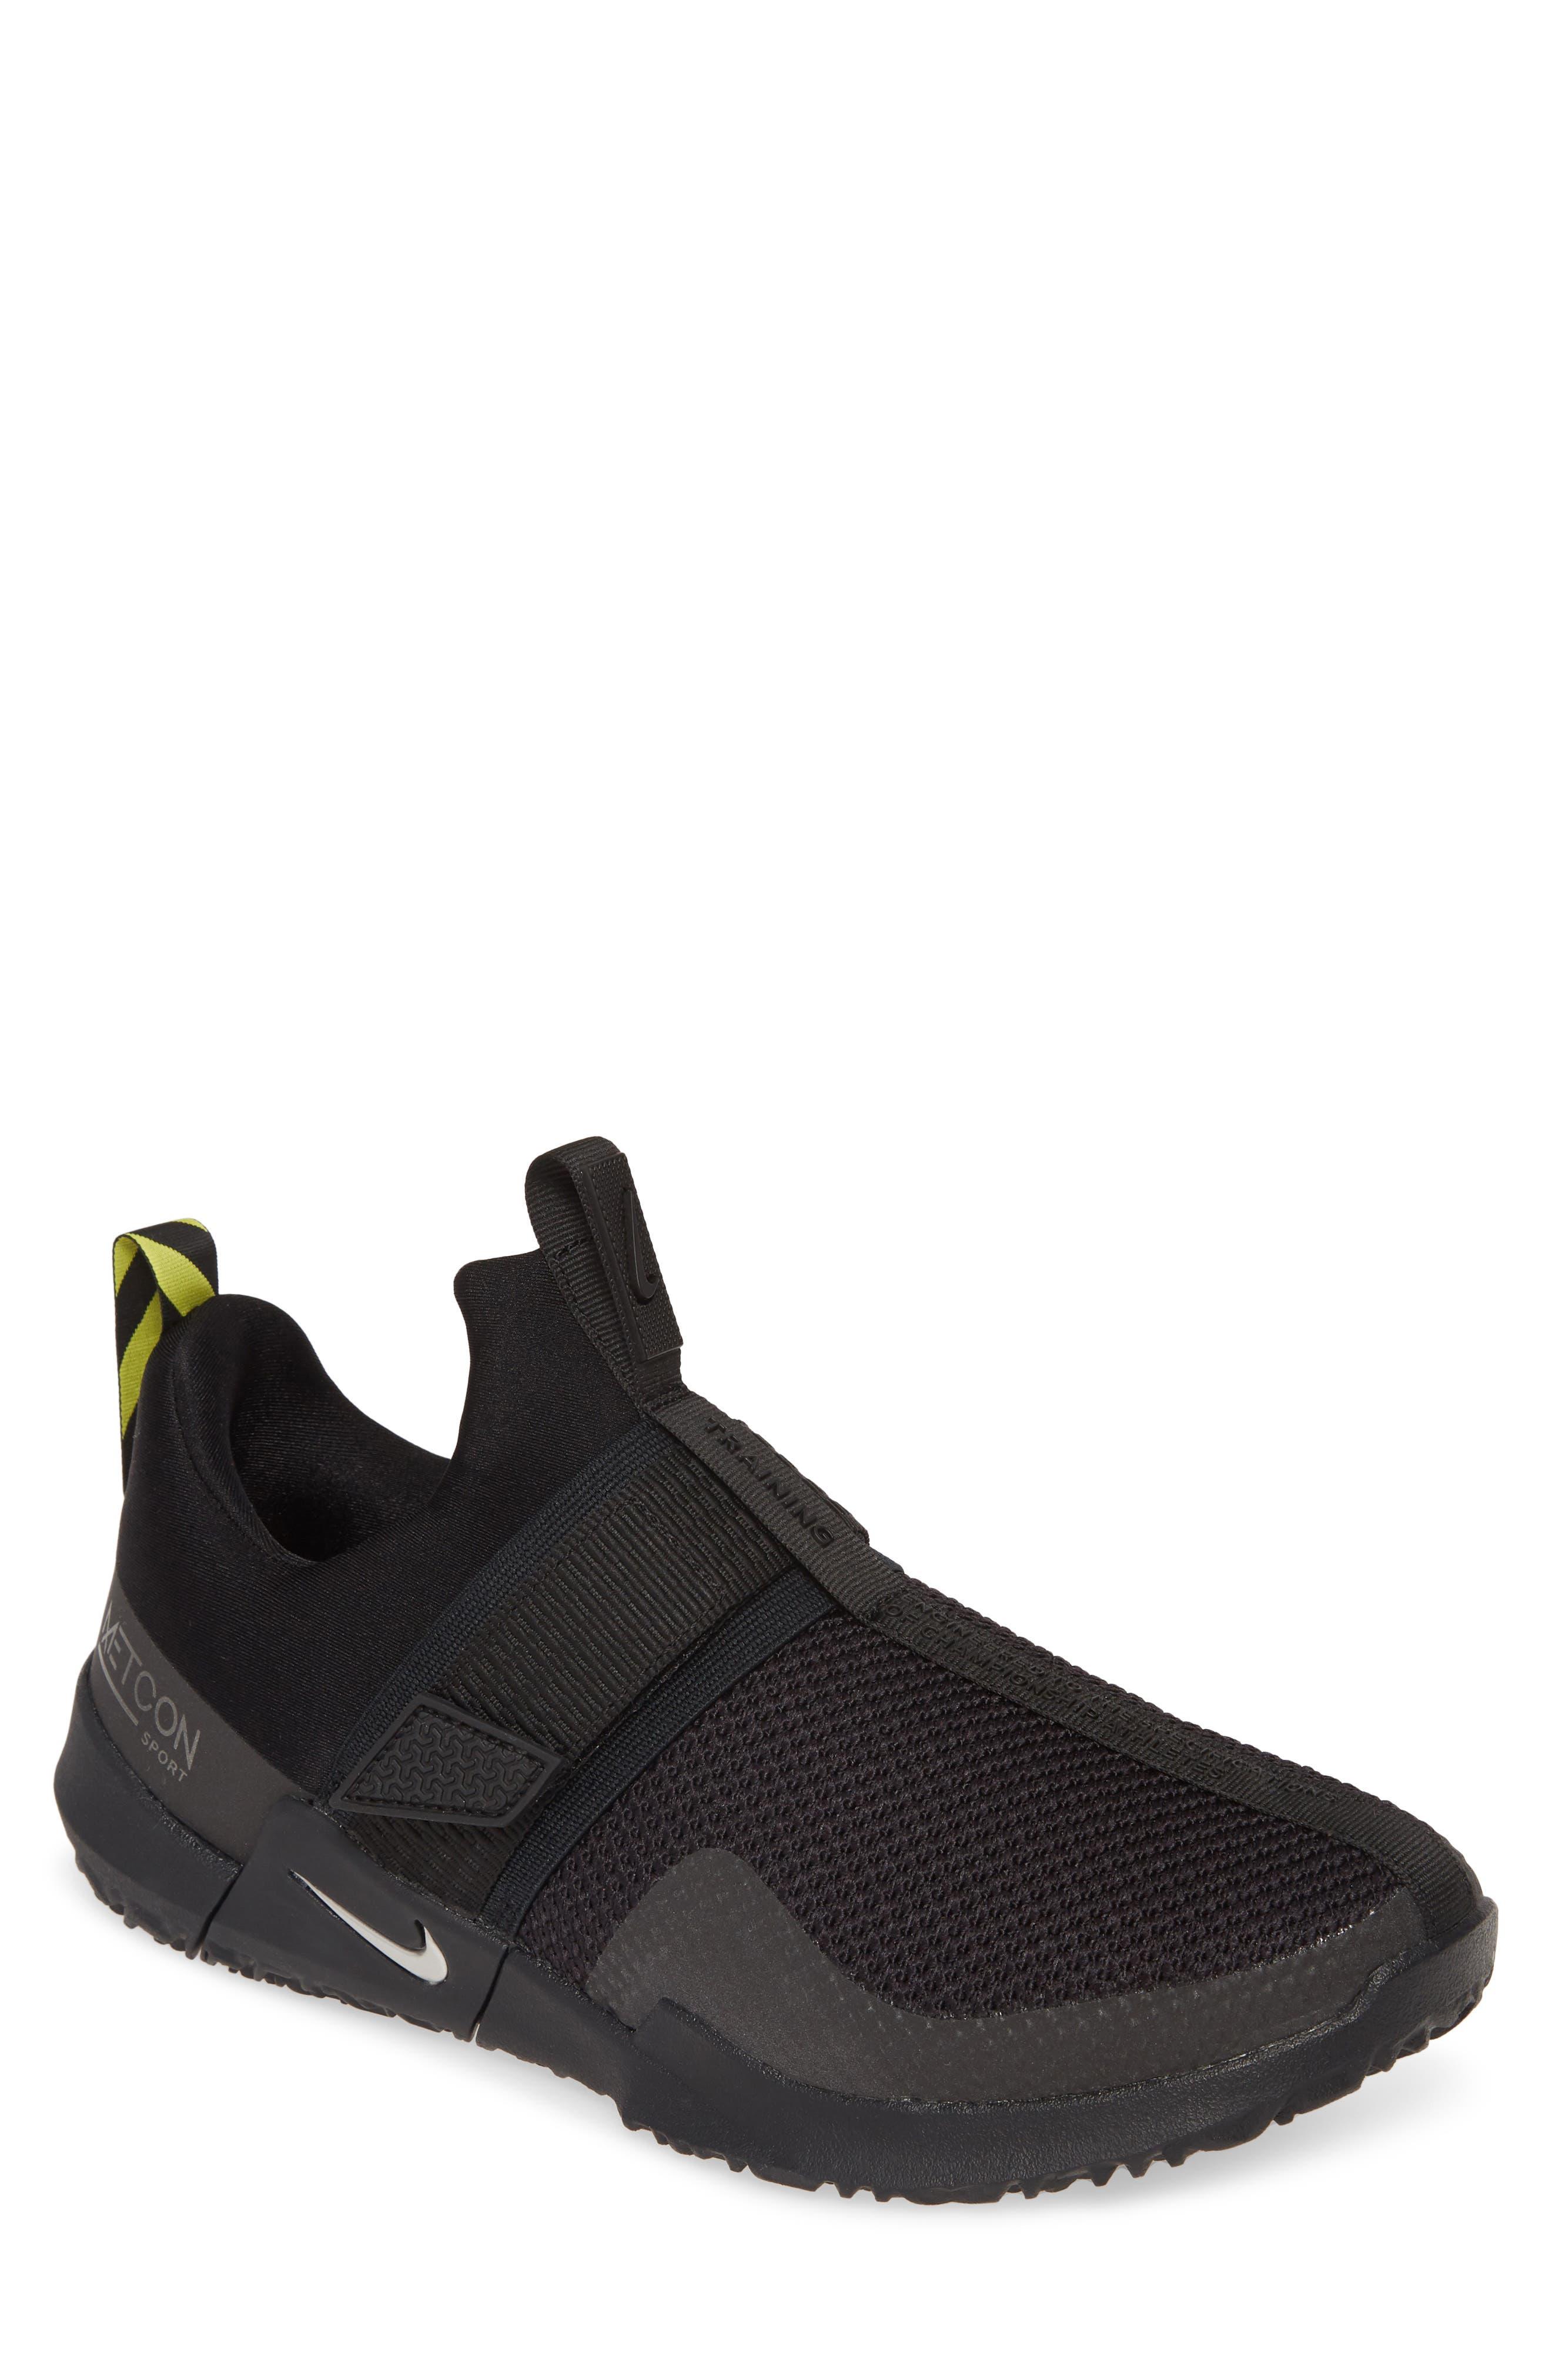 Nike   Metcon Sport Russell Wilson